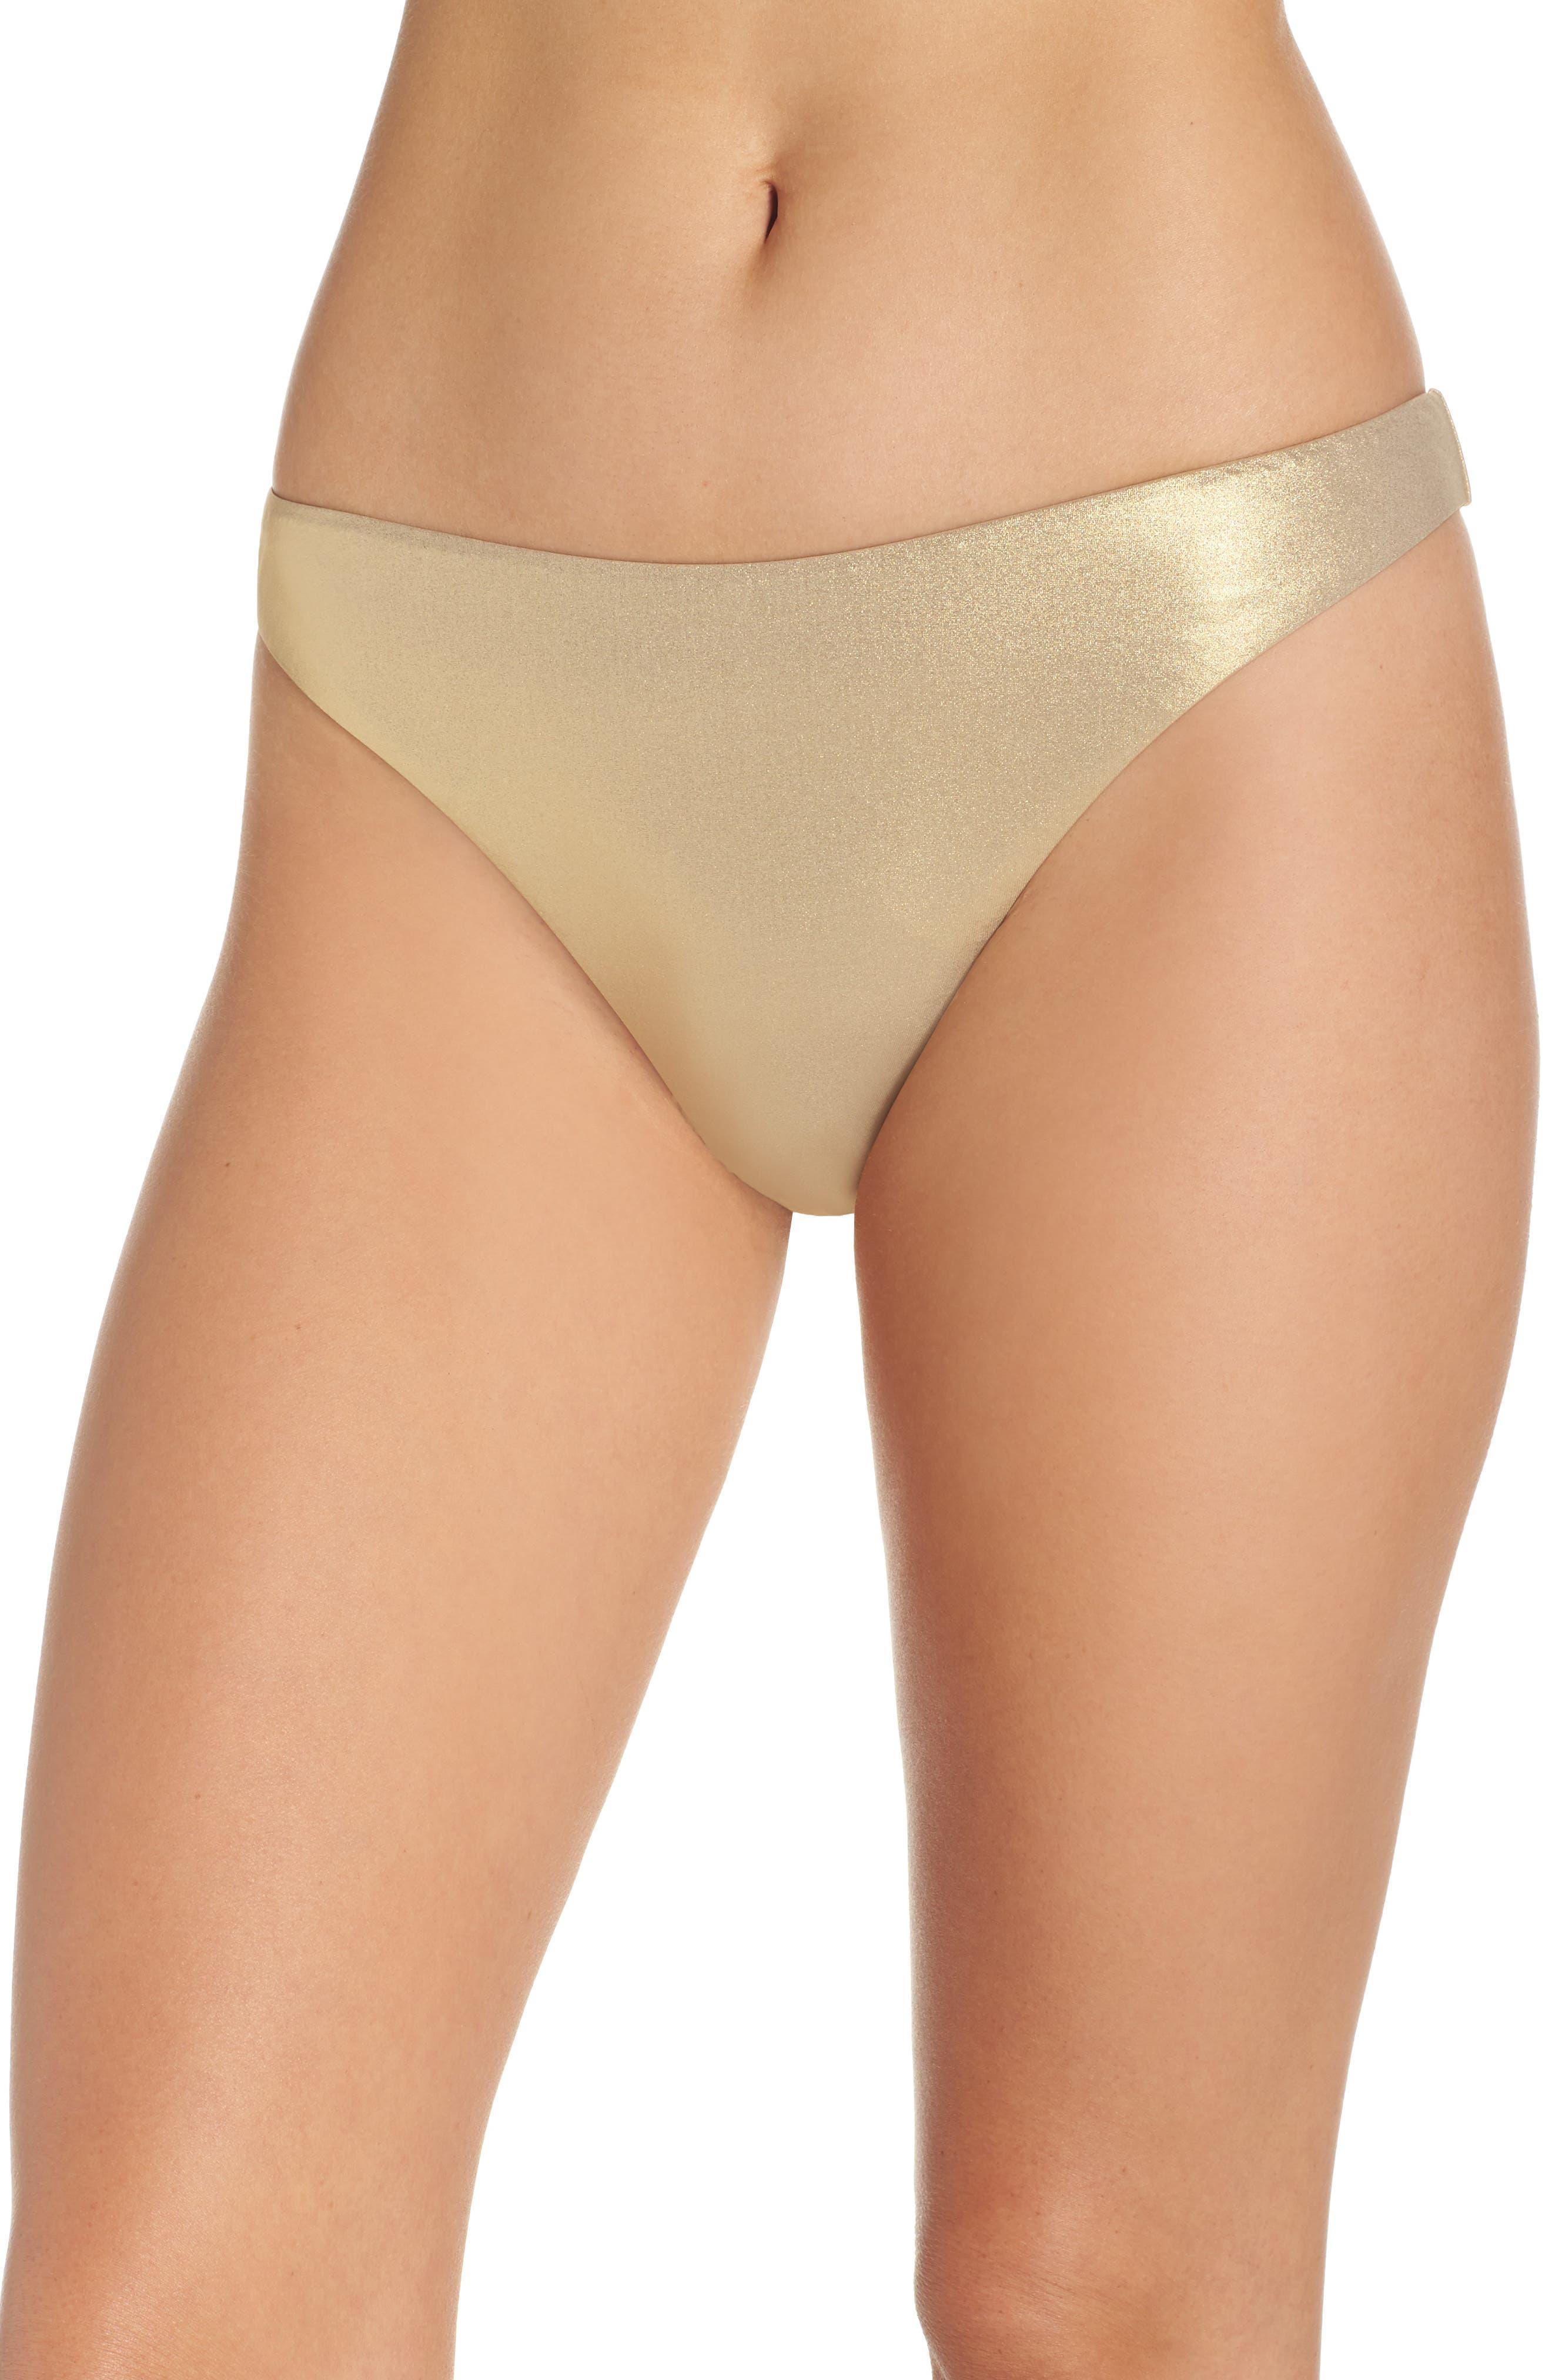 Golden Medallion Bikini Bottoms,                             Main thumbnail 1, color,                             Gold